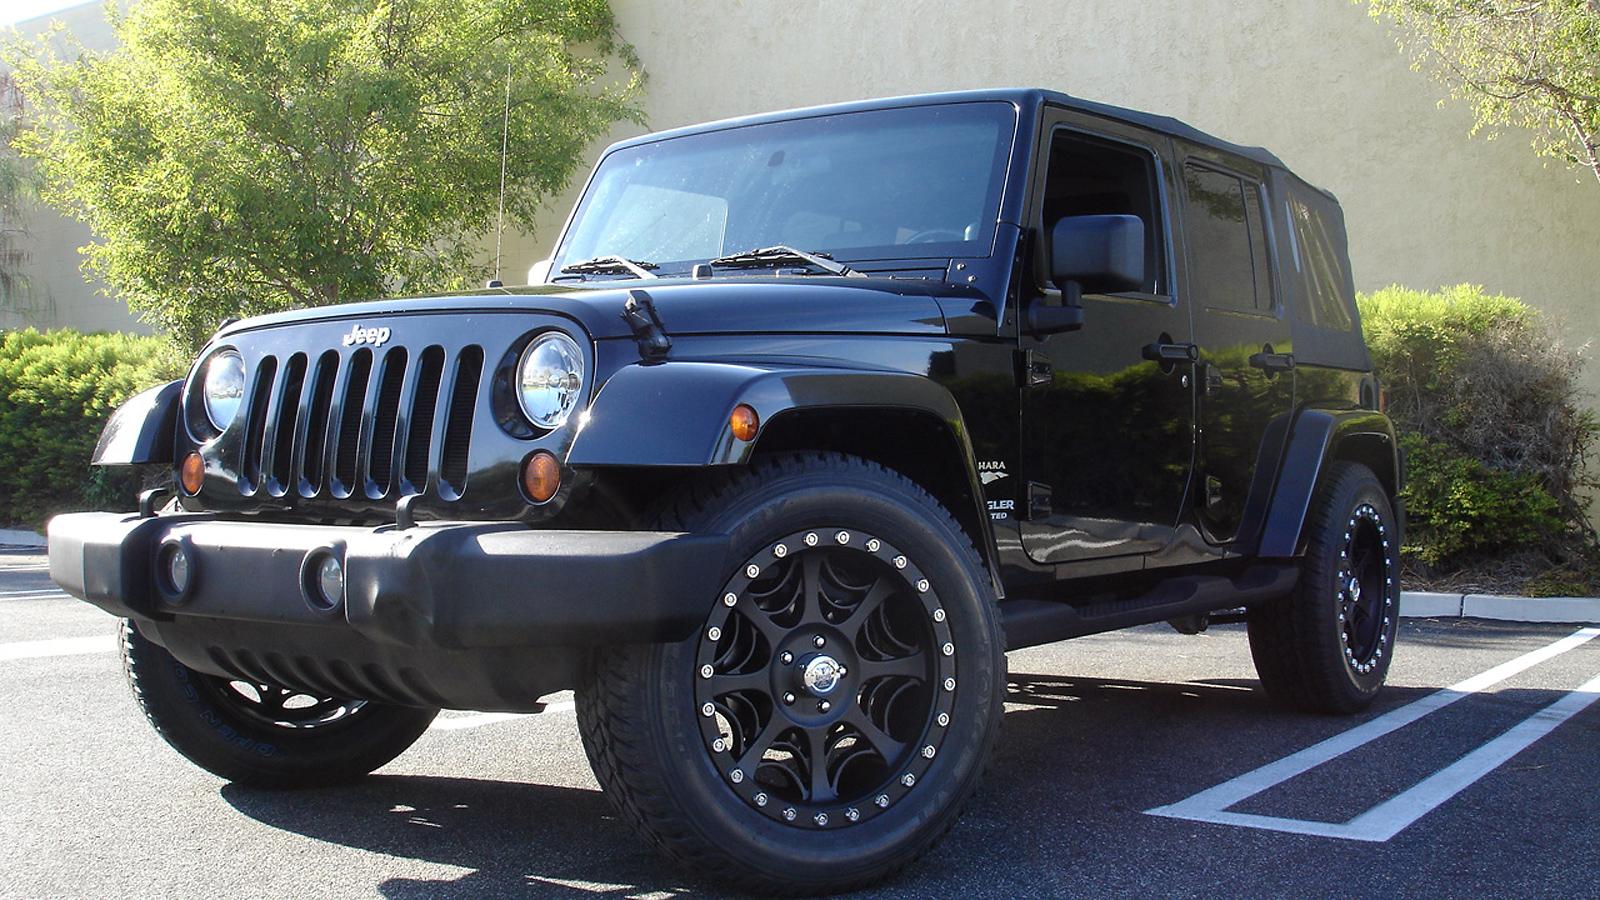 Jeep Wrangler White On Black >> Jeep Wrangler Black Widow Gallery - MHT Wheels Inc.